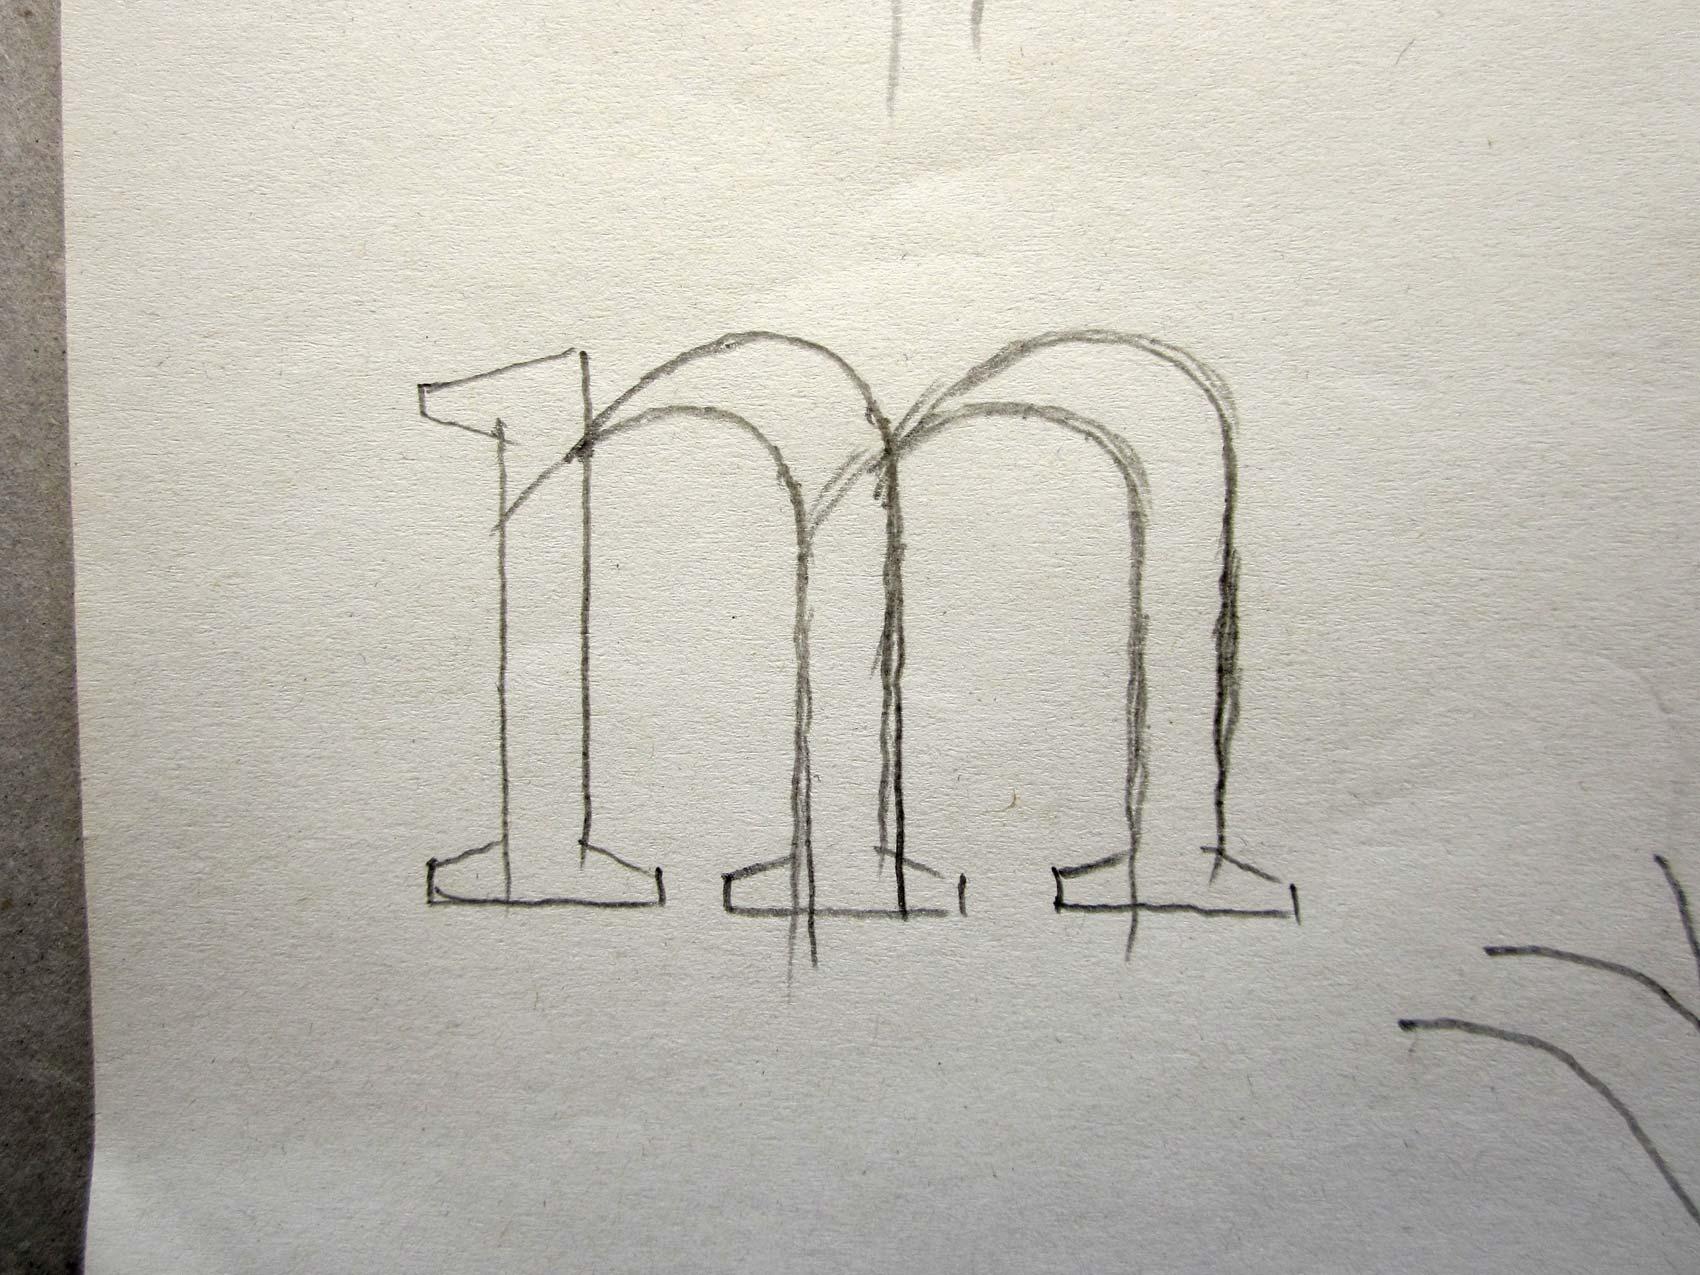 05_Sketches_Step2_b.jpg